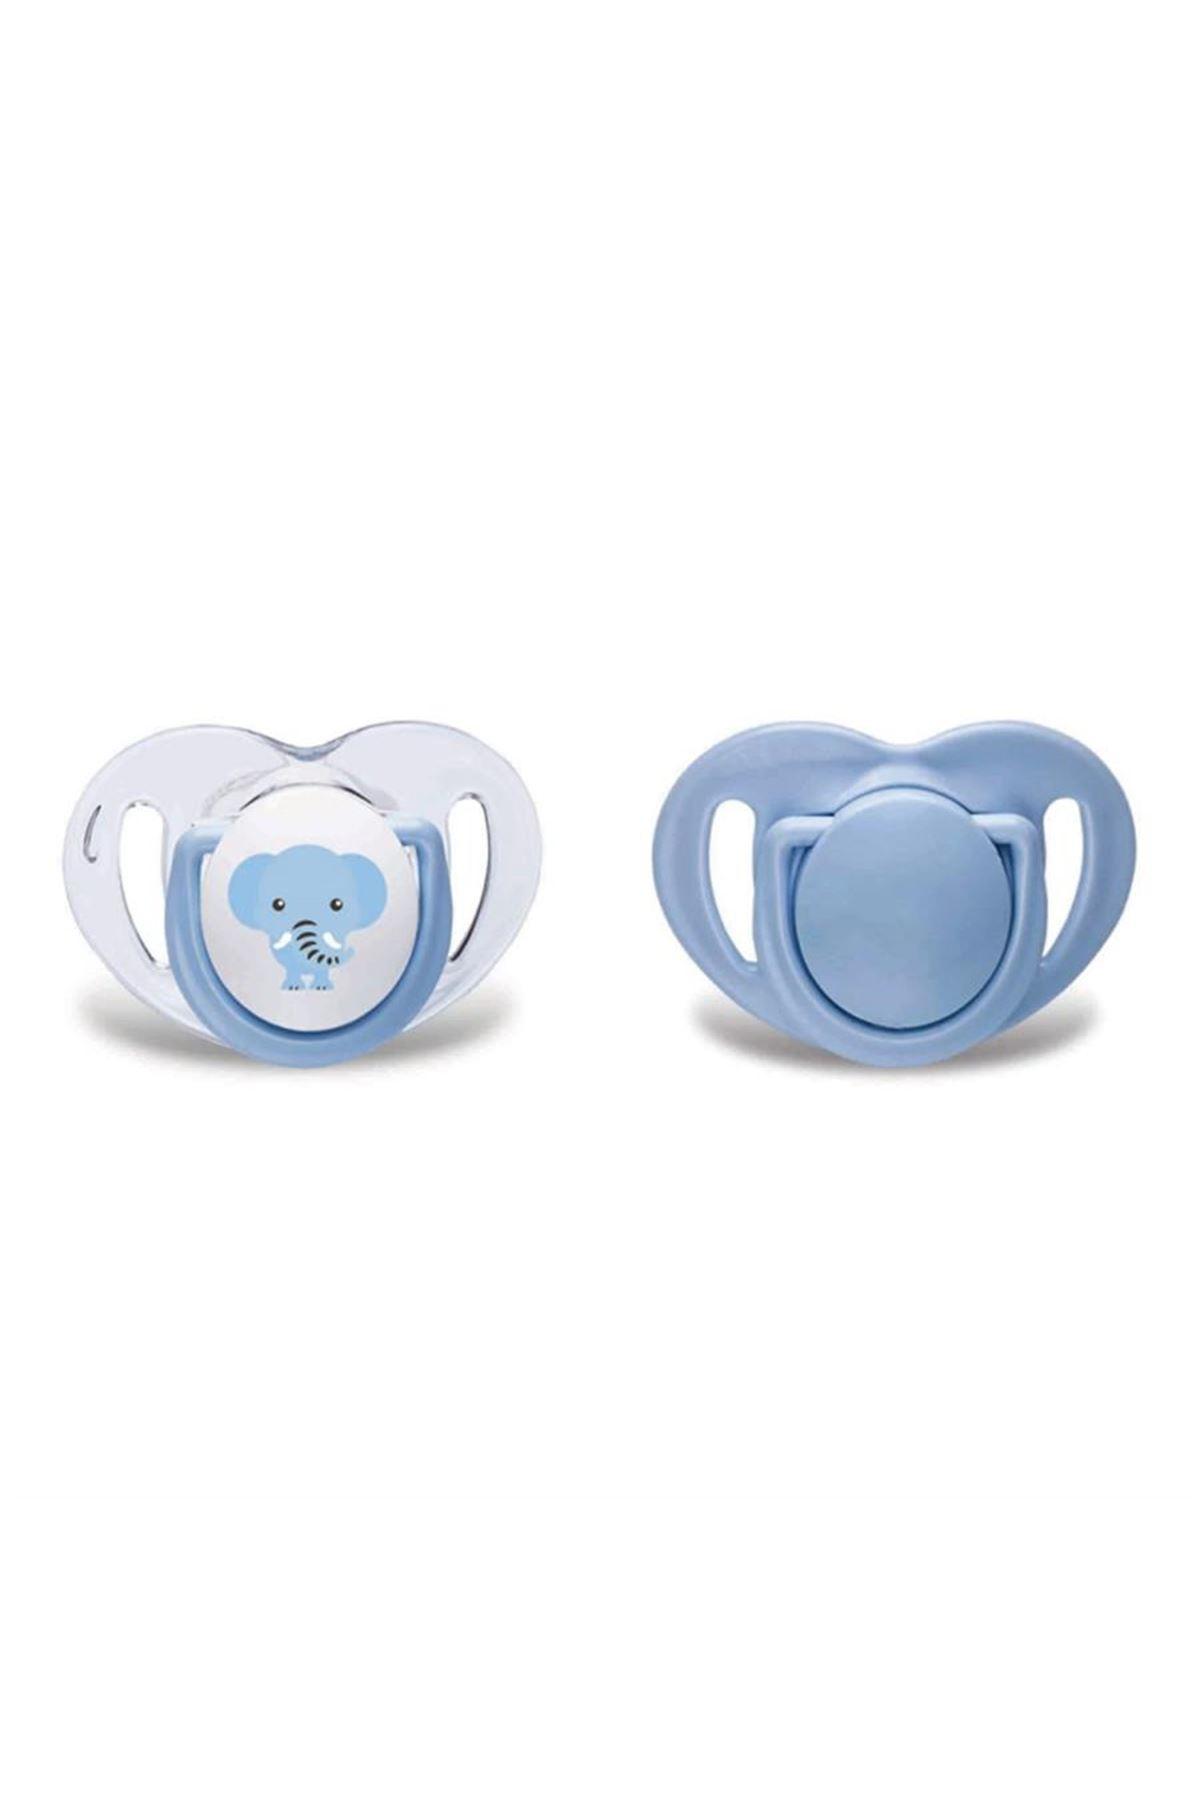 Mamajoo Silikon Ortodontik İkili Emzik Mavi Fil / 0 ay +